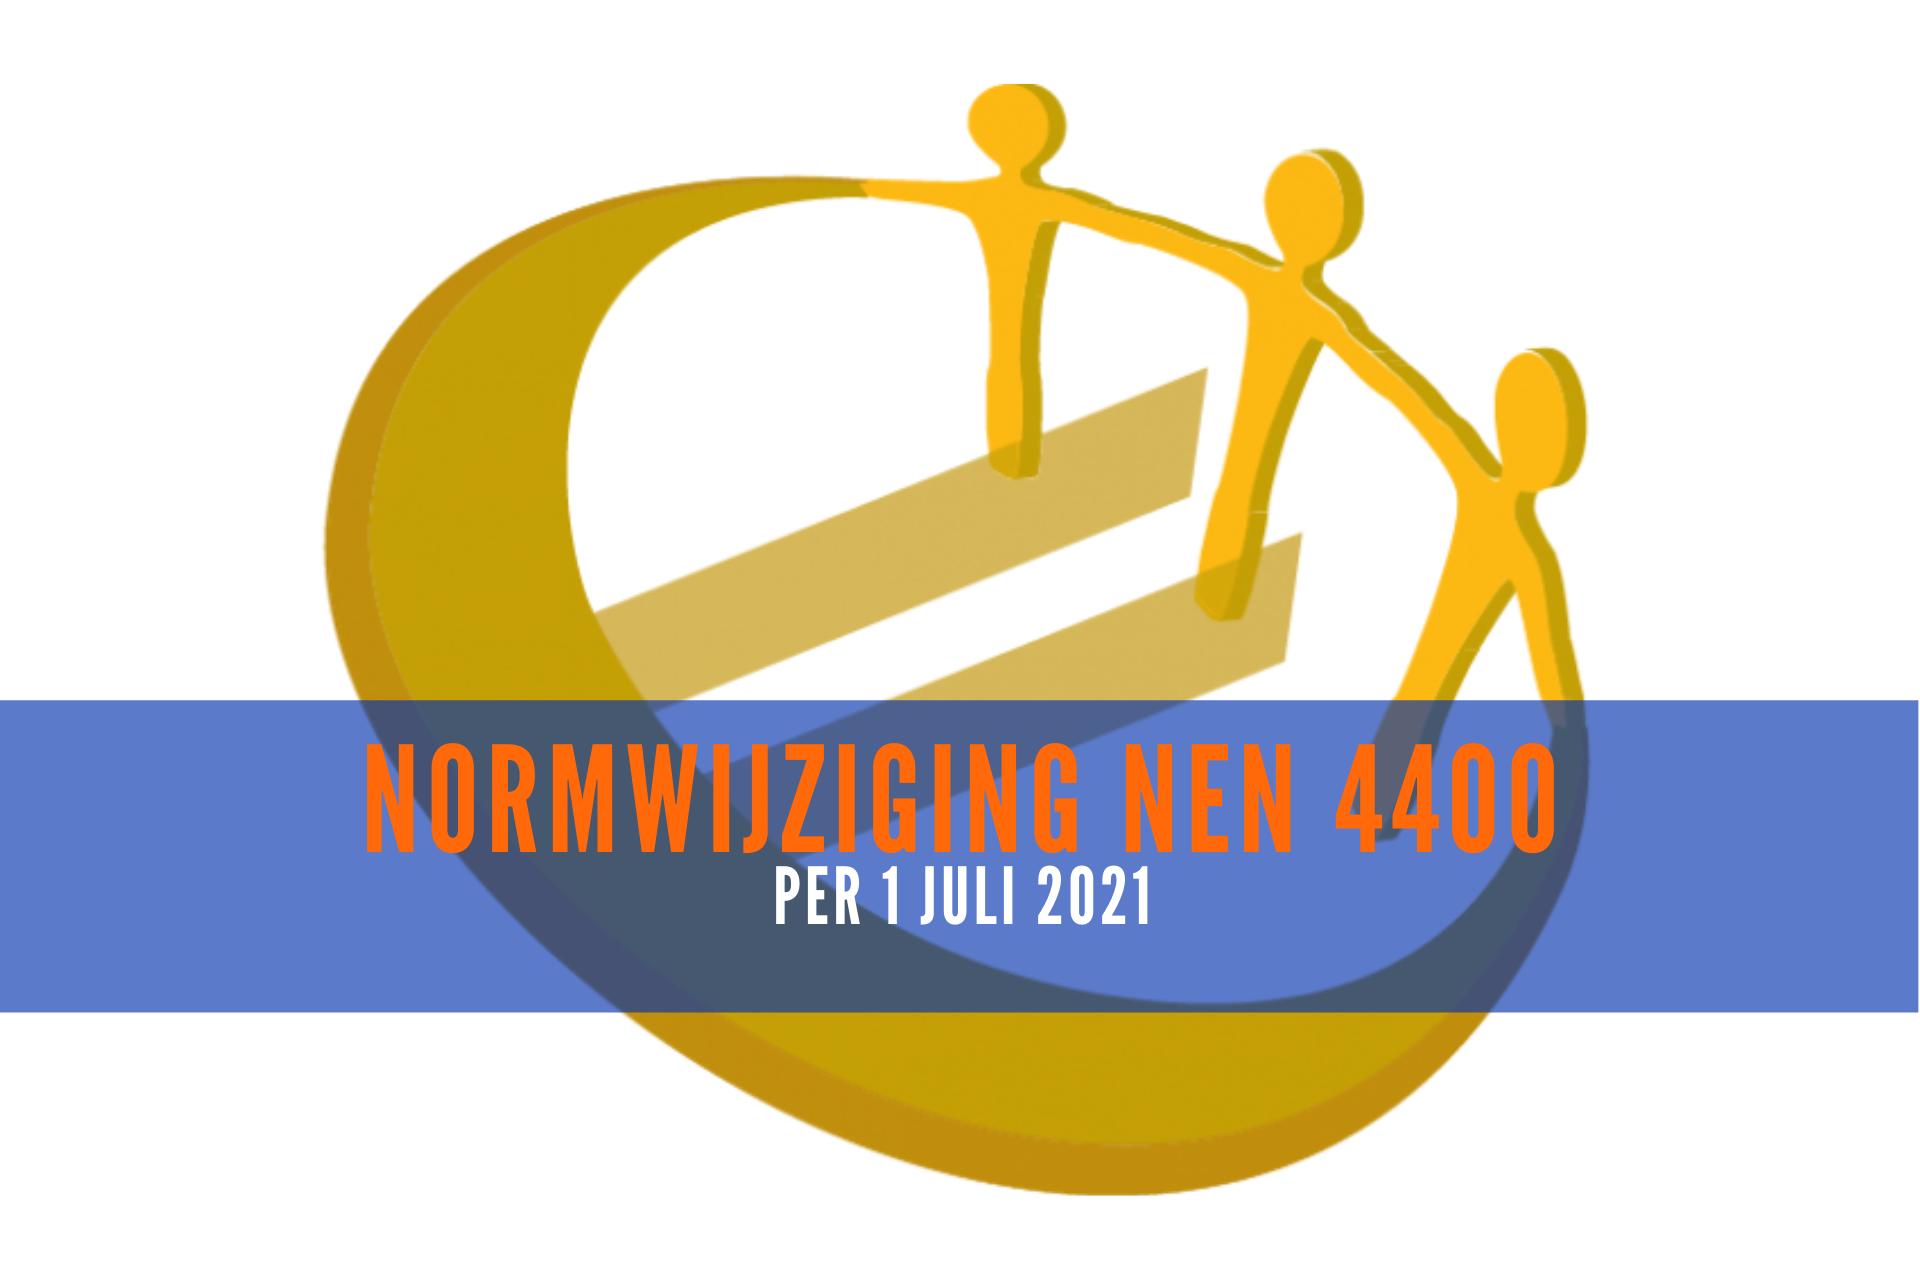 Normwijziging-NEN-4400